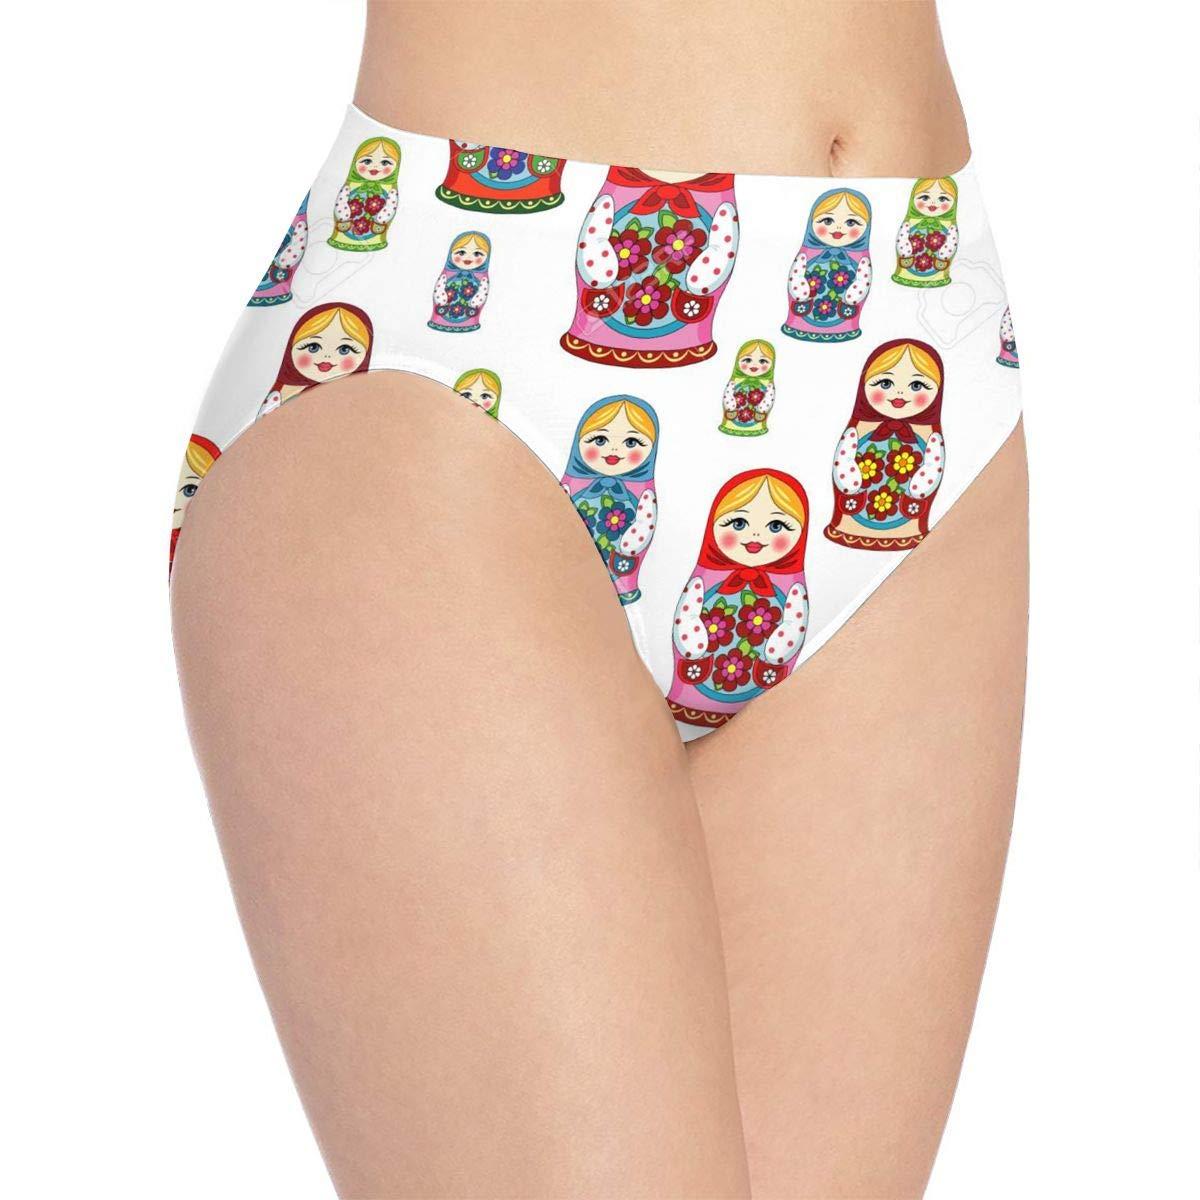 Russian girls in panties